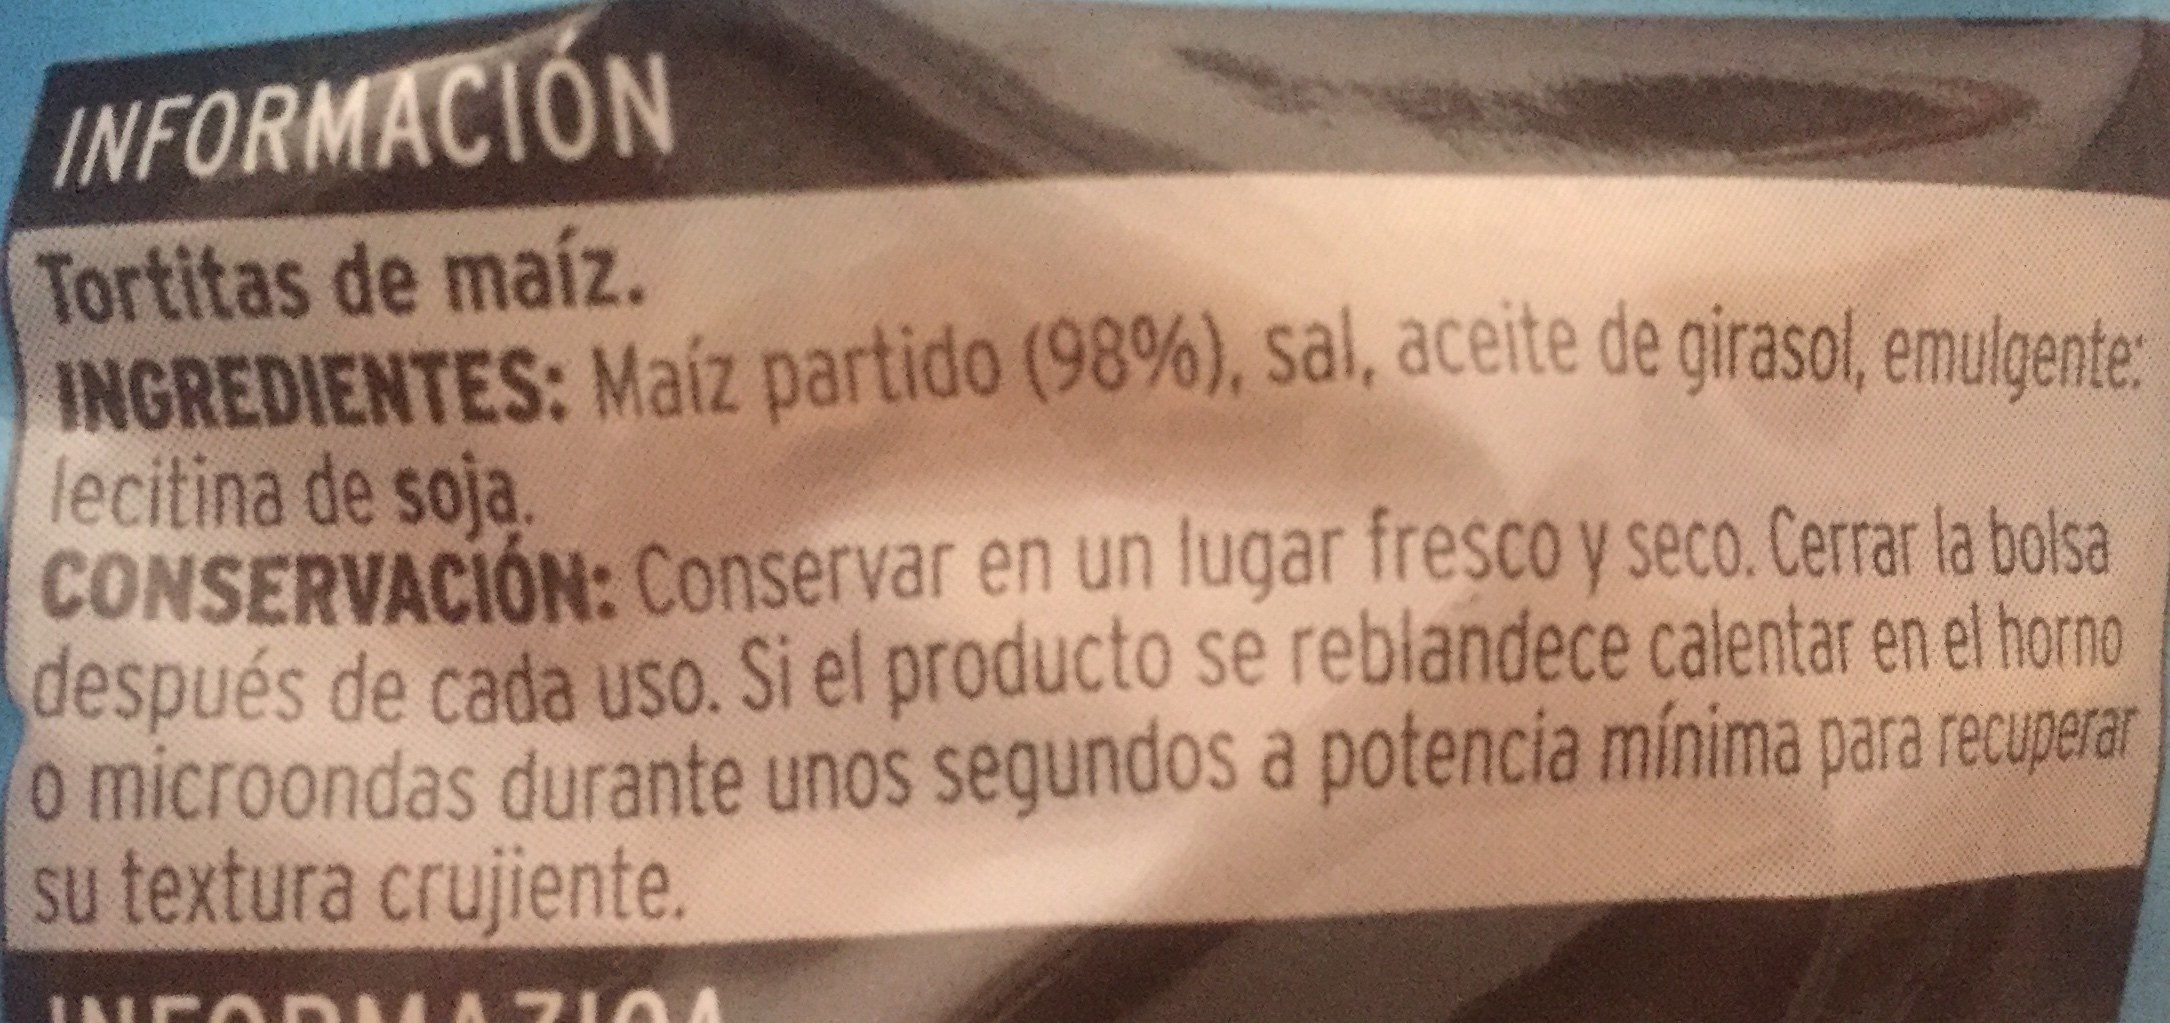 Sannia - Tortitas de maíz - Ingrédients